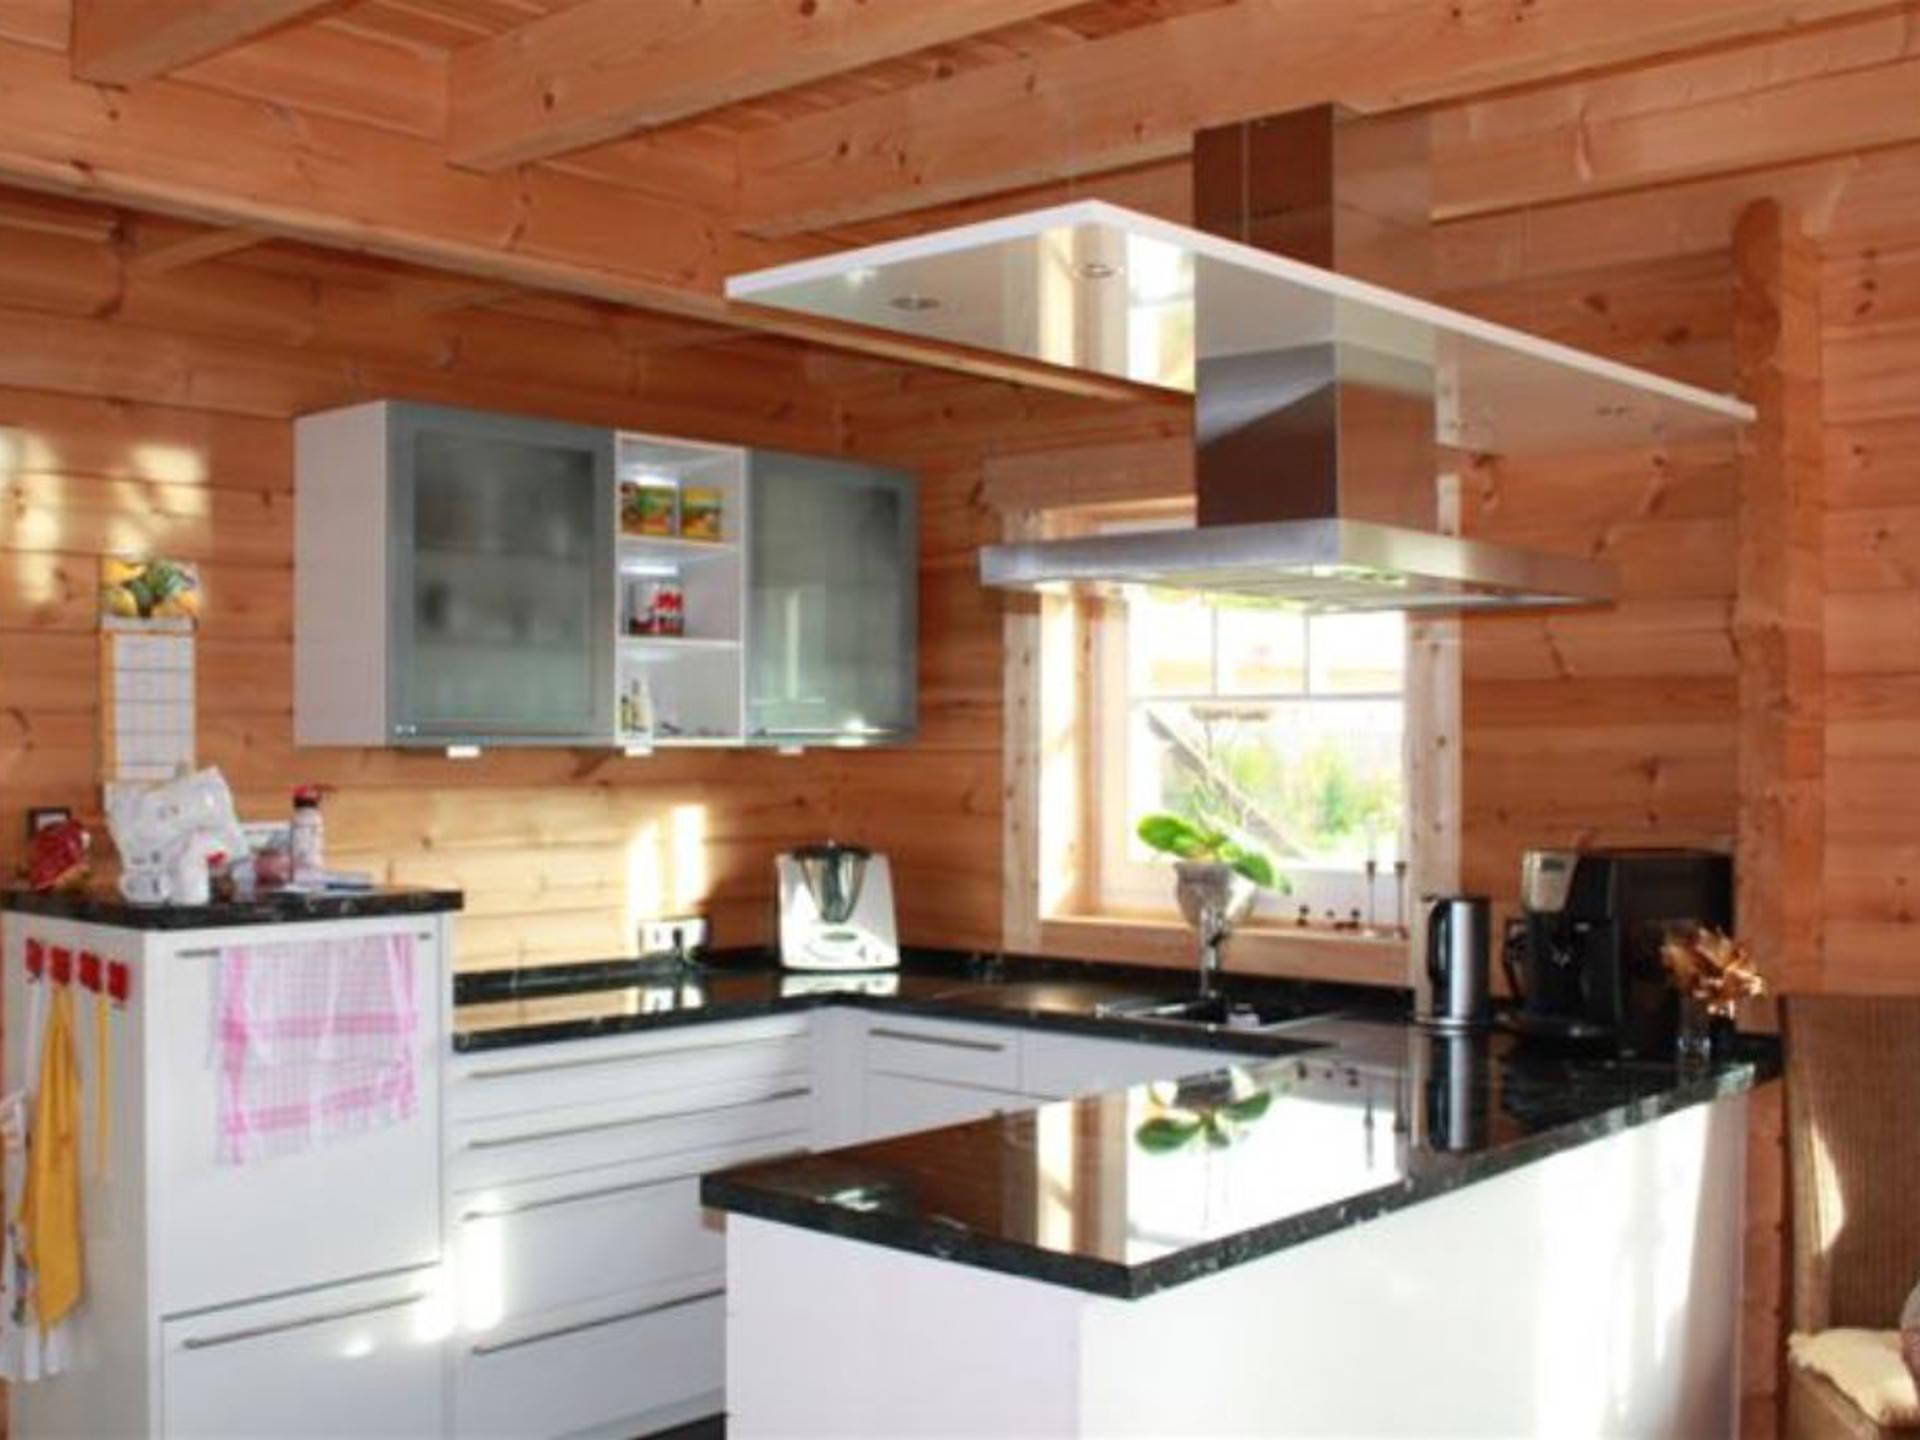 Blockhaus Kühling - Nordic Haus Blockhäuser